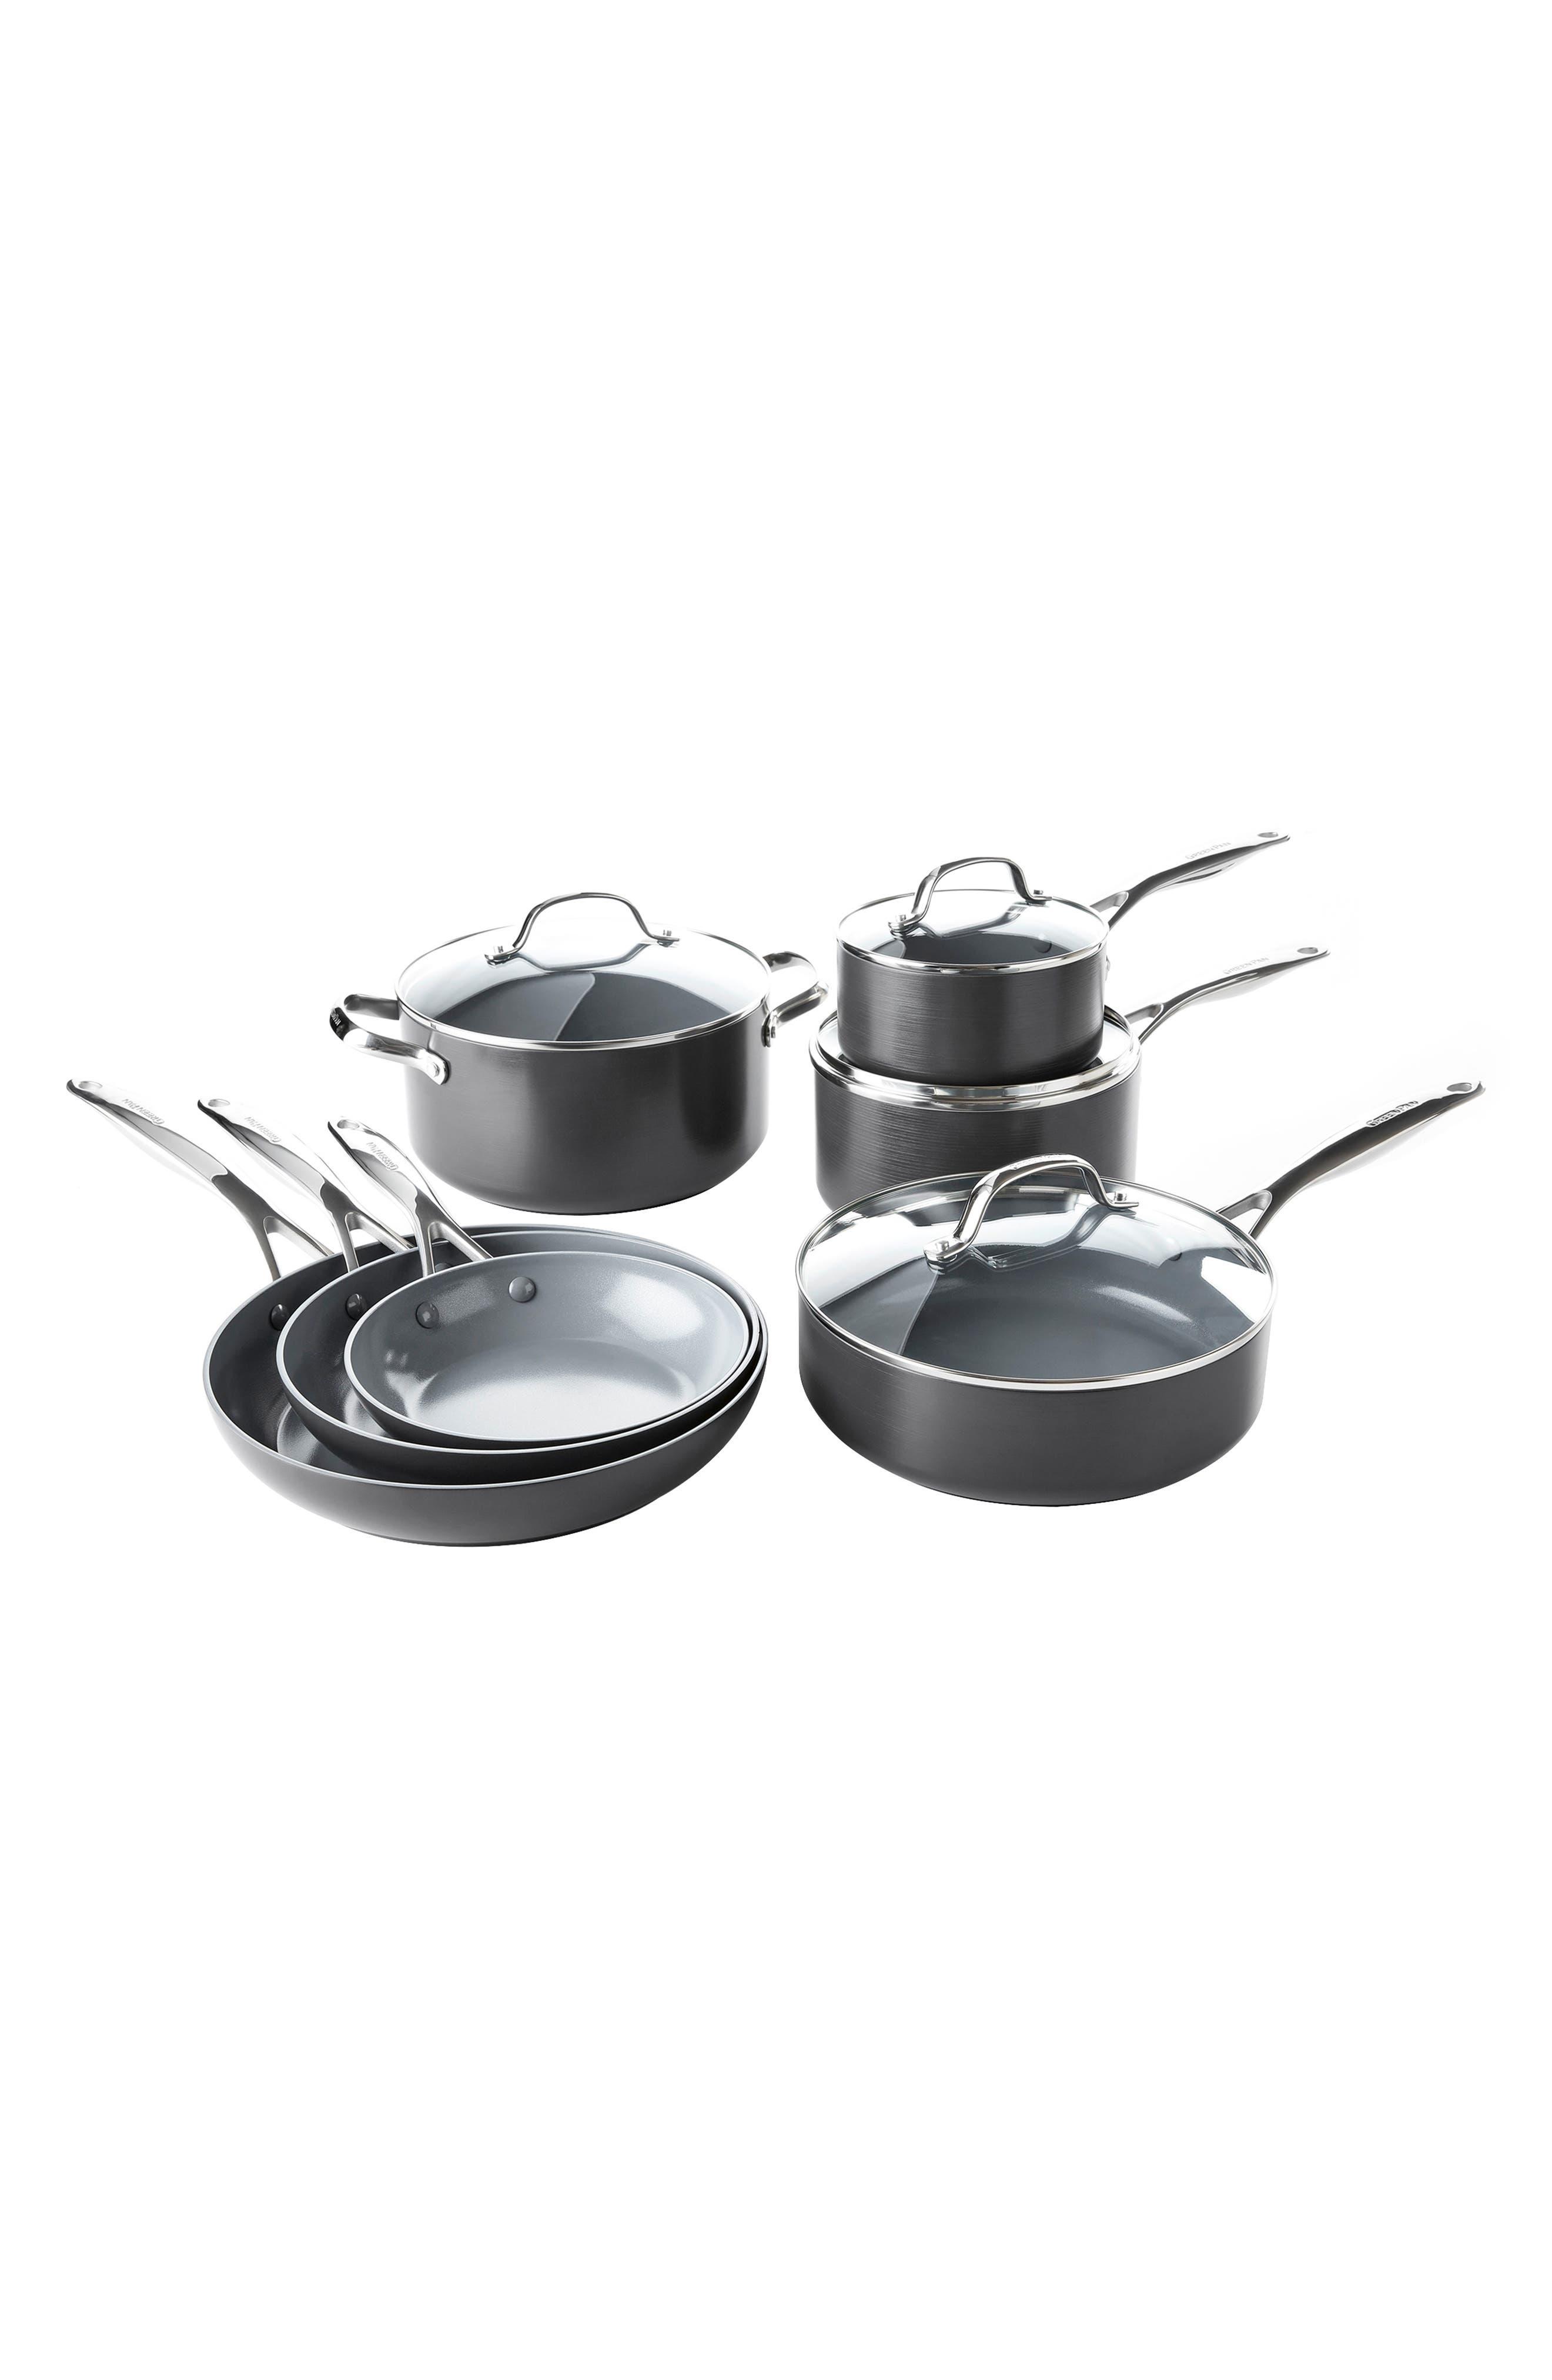 Valencia Pro 11-Piece Anodized Aluminum Ceramic Nonstick Cookware Set,                             Main thumbnail 1, color,                             Black